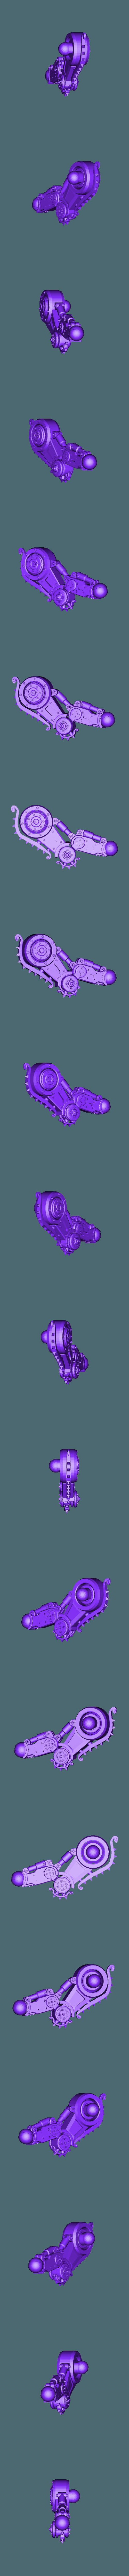 Penny 2.0 Leg 3B.stl Download STL file Penny Nun Bot 2.0 • 3D print model, Leesedrenfort